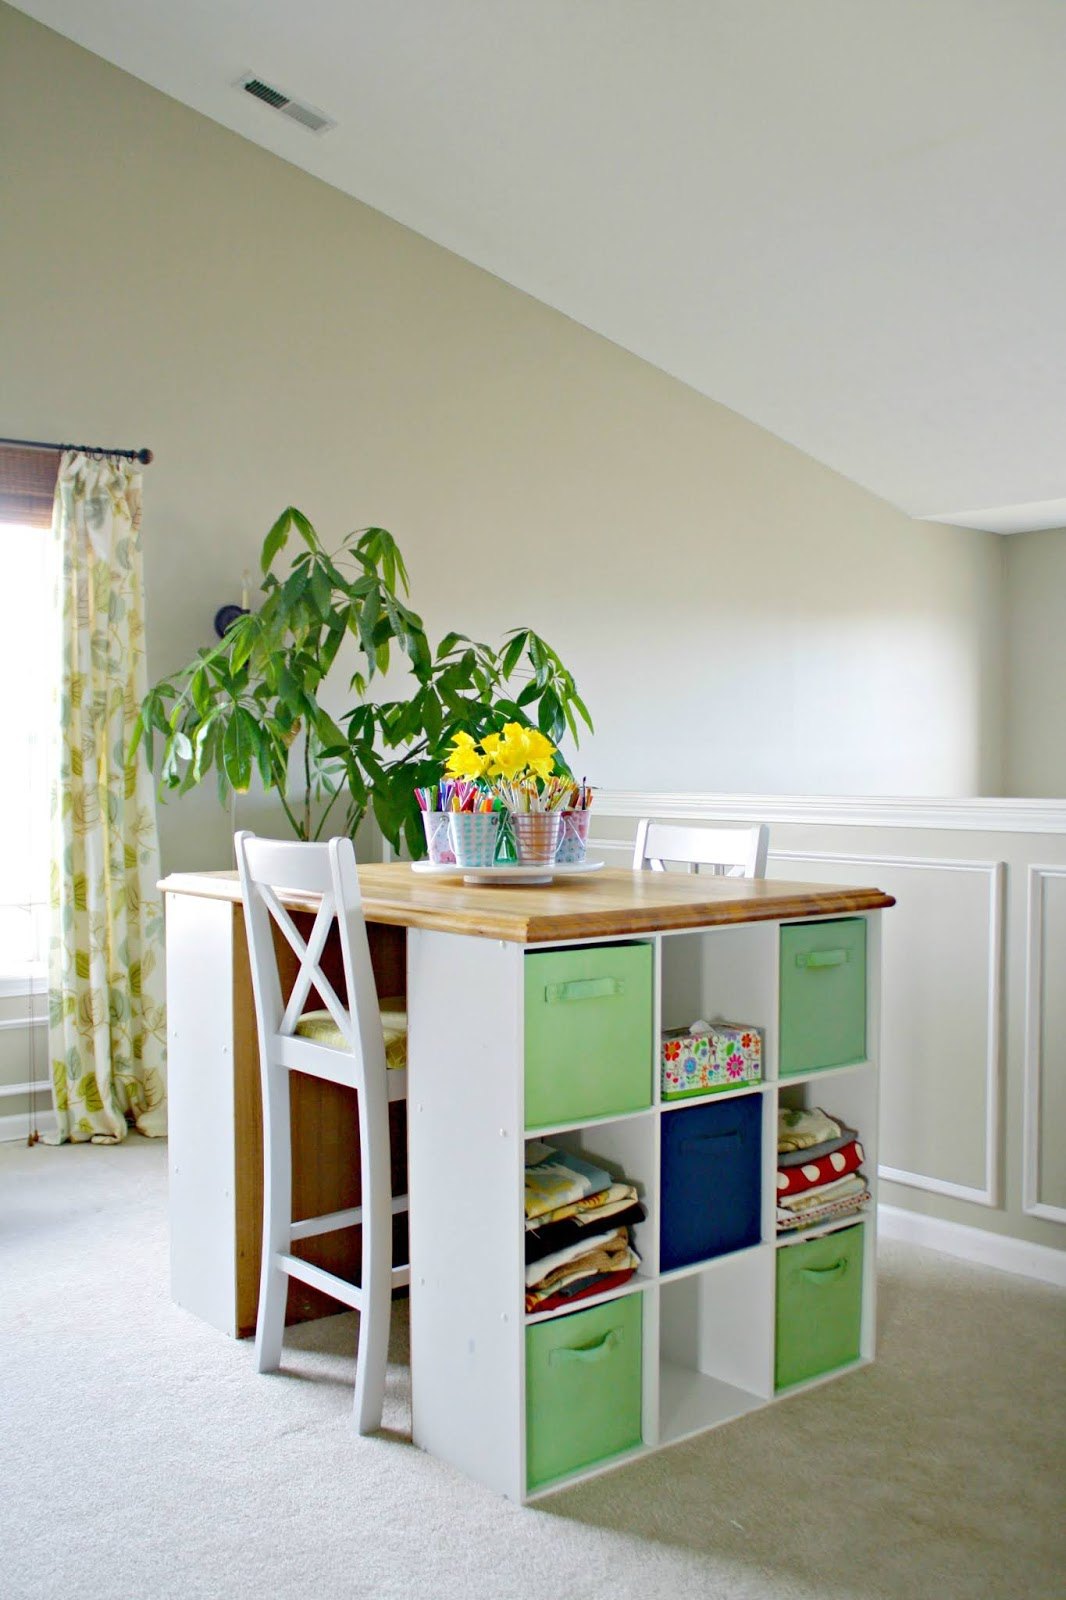 DIY craft desk with cubbies